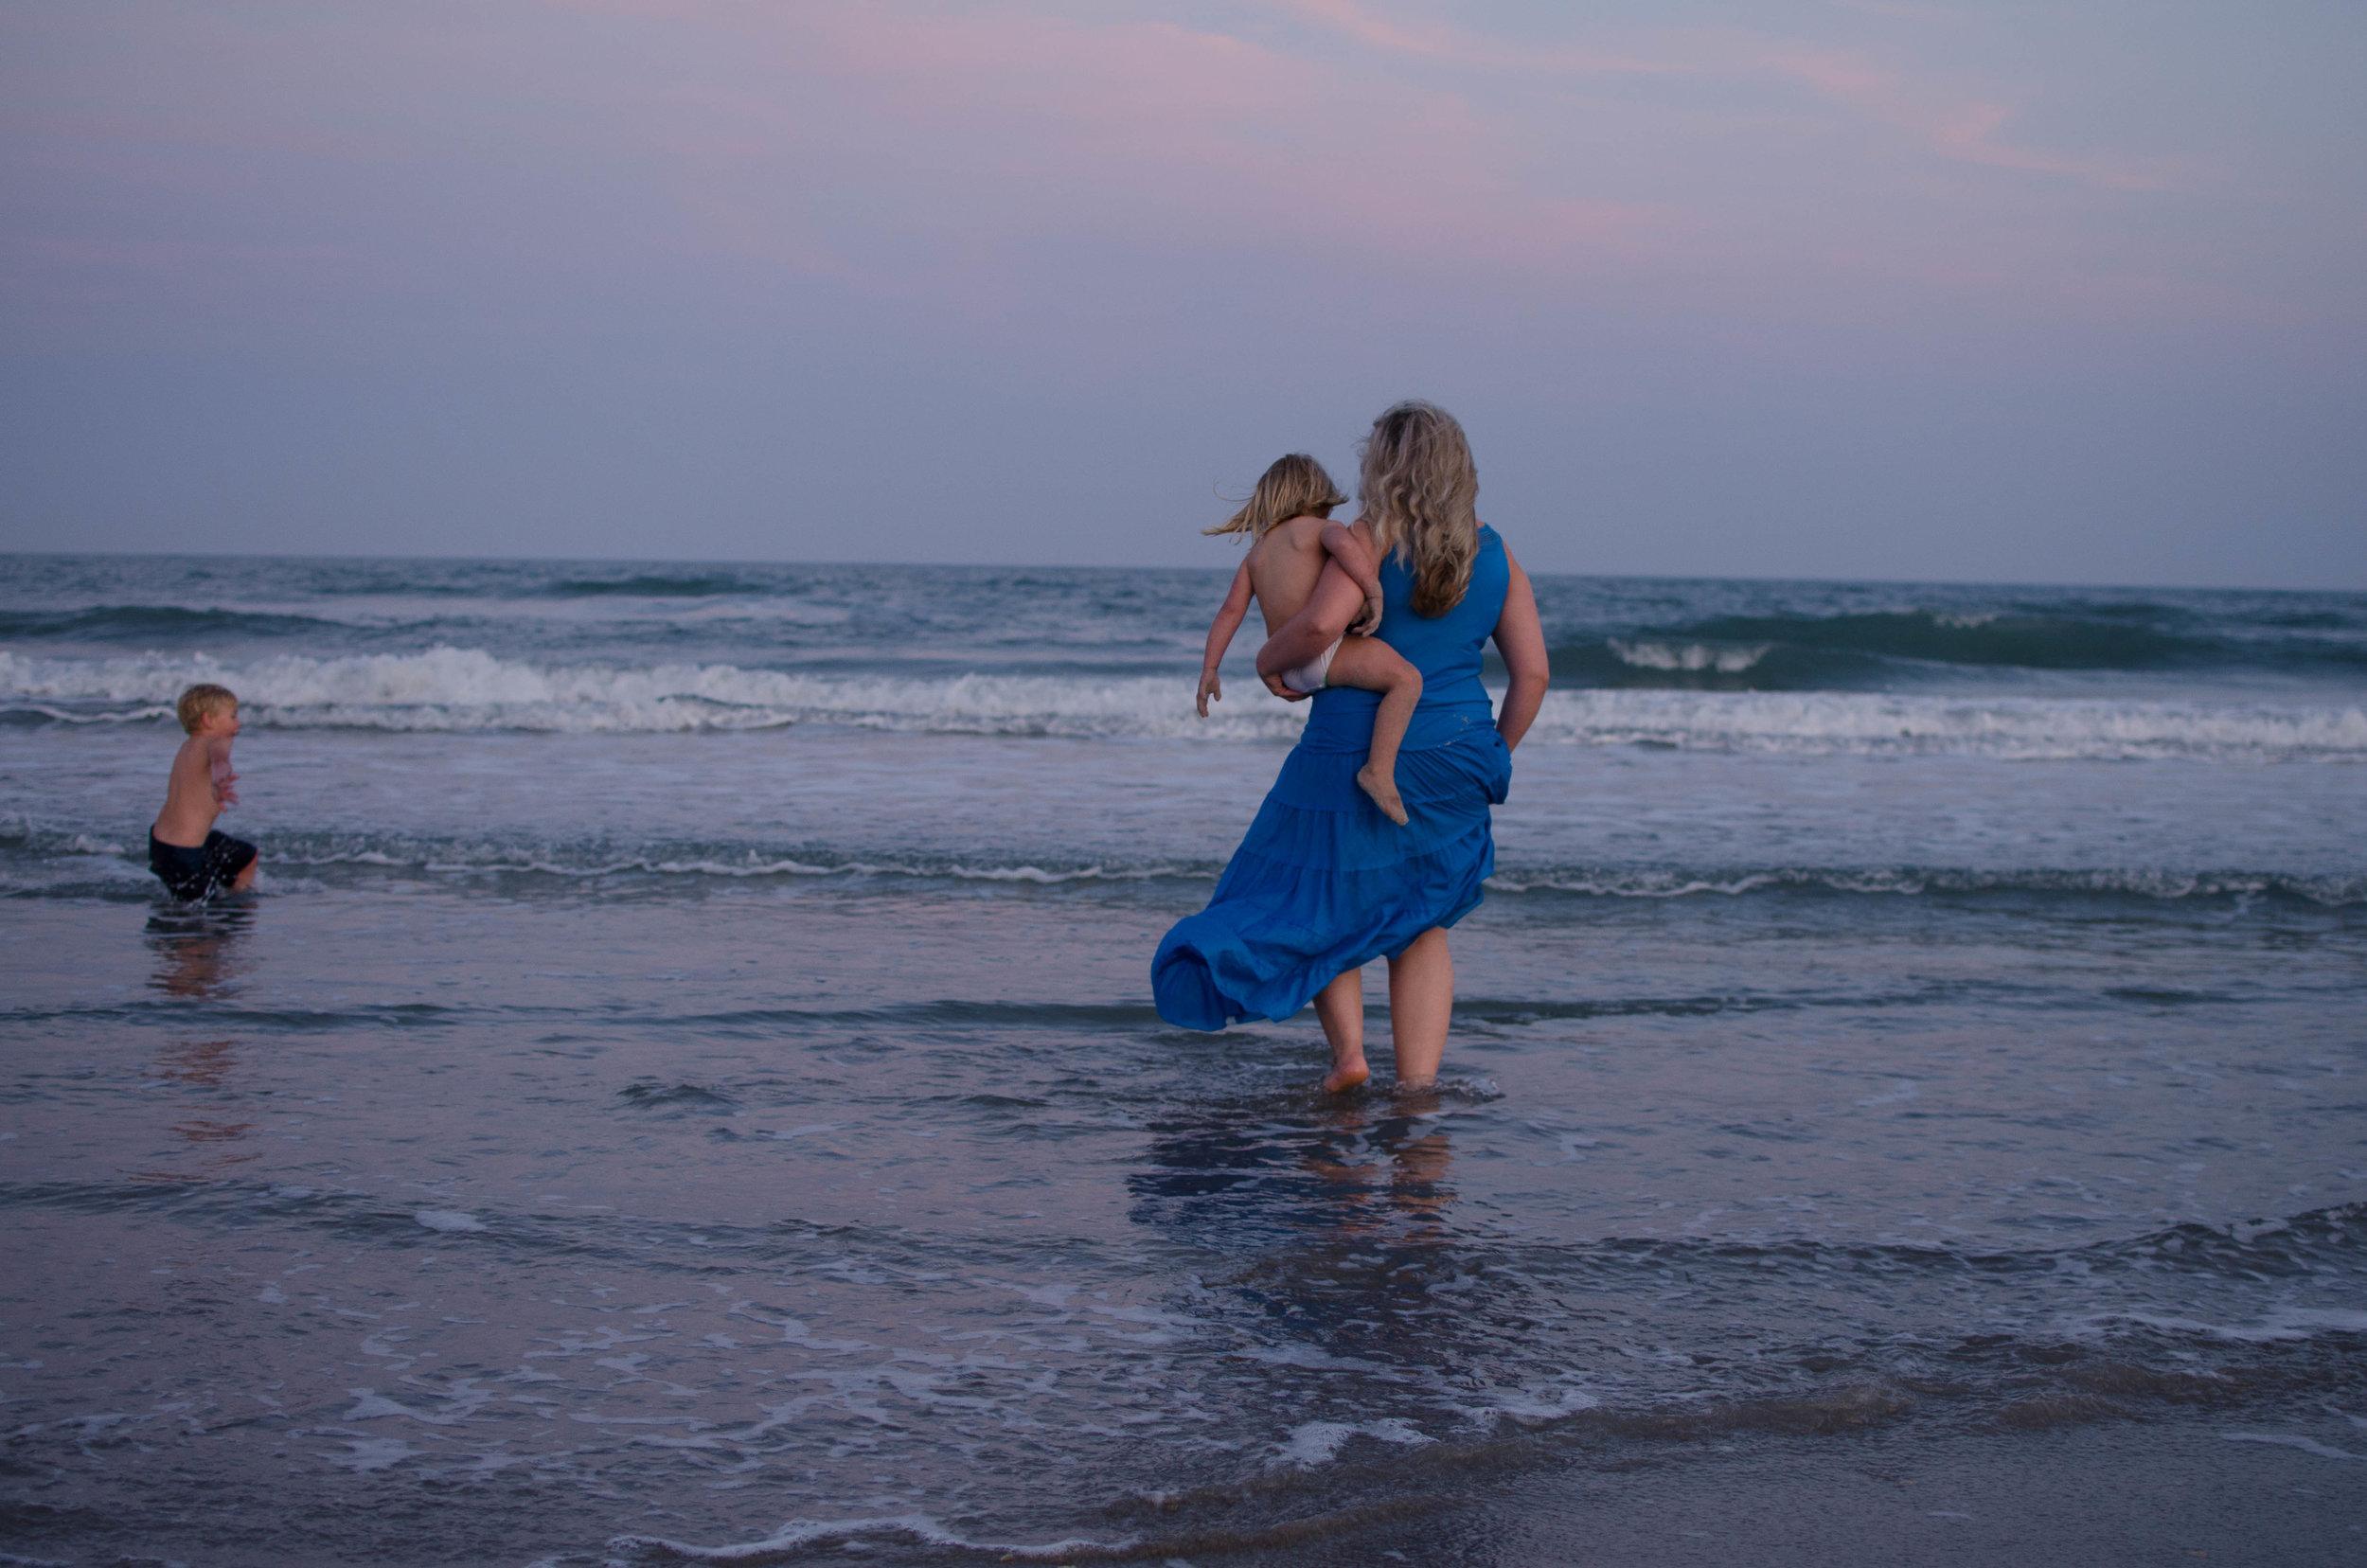 Assateague Island Photographer - Family Photographer - Pittsburgh Family Photographer - Beach Photography-2896-2.jpg